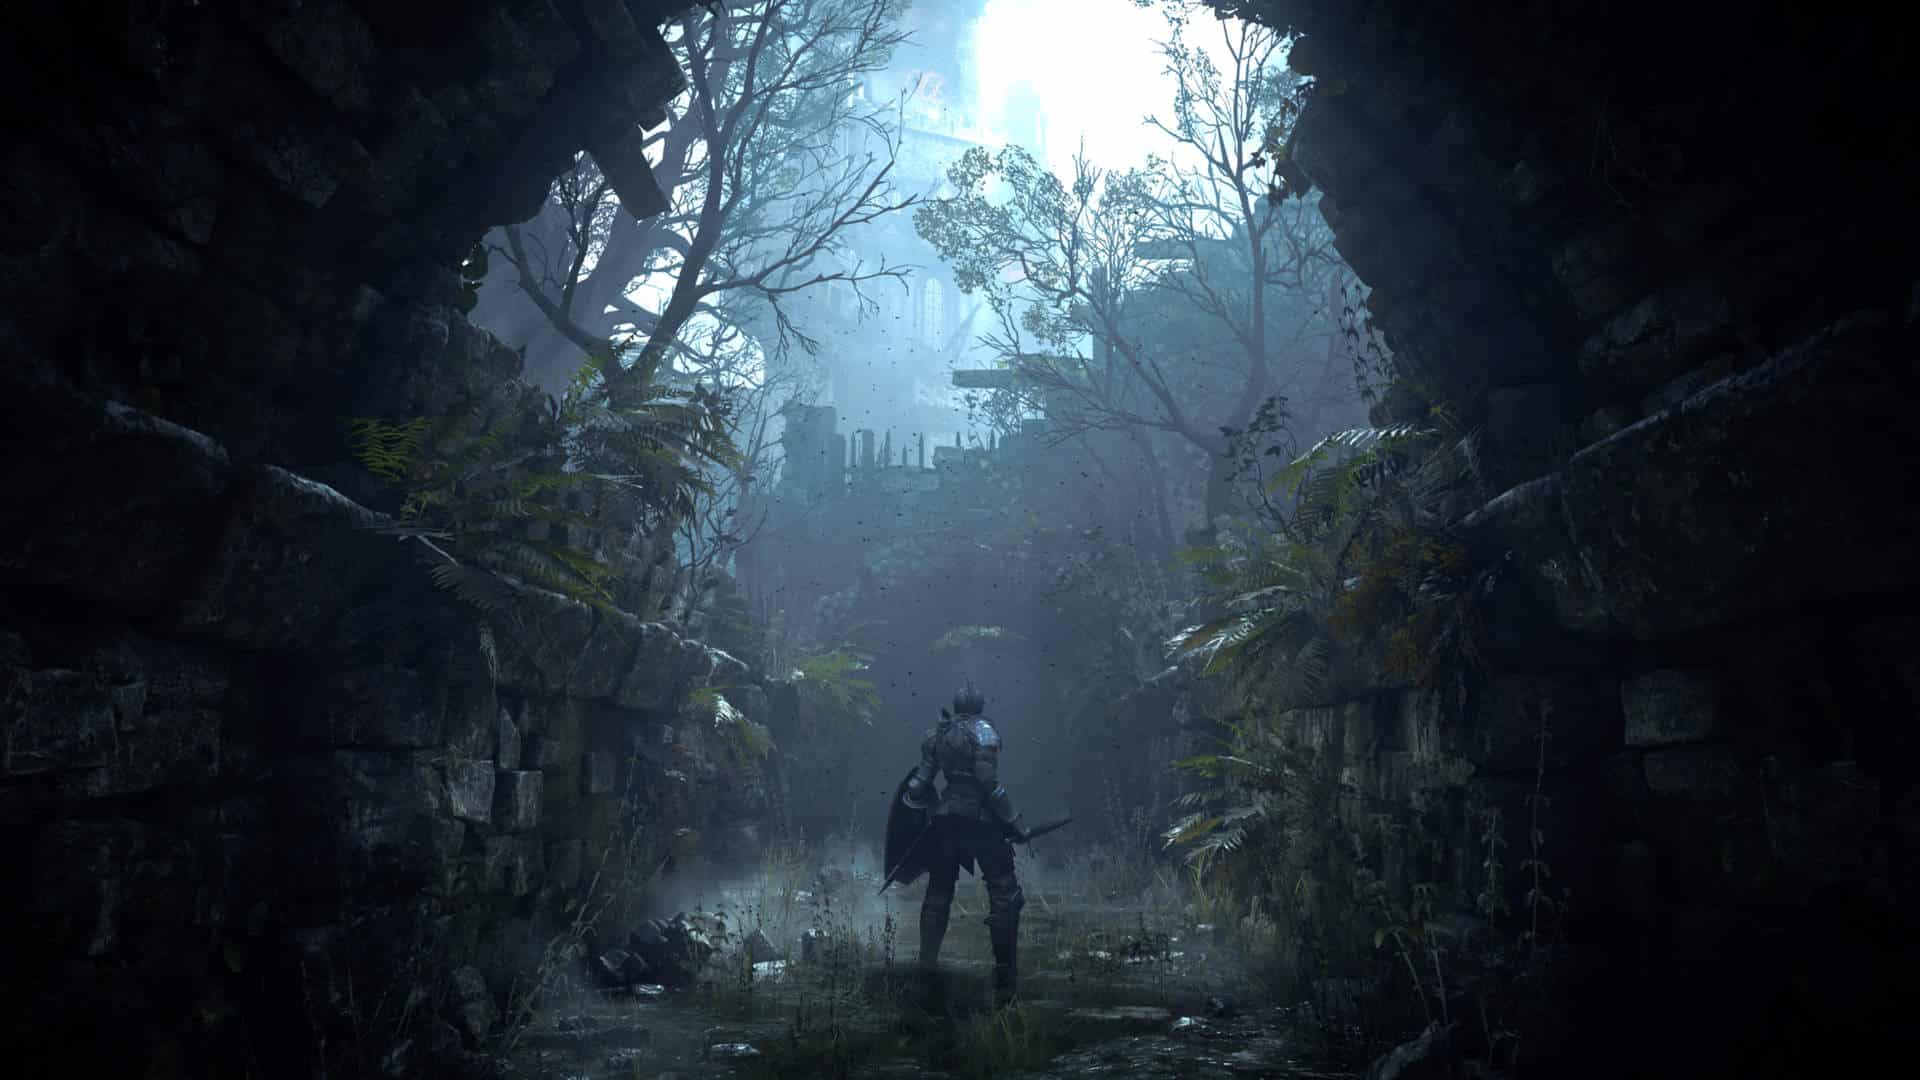 PlayStation 5 FromSoftware Bluepoint Games Sony Japan Studio remake Demon's Souls